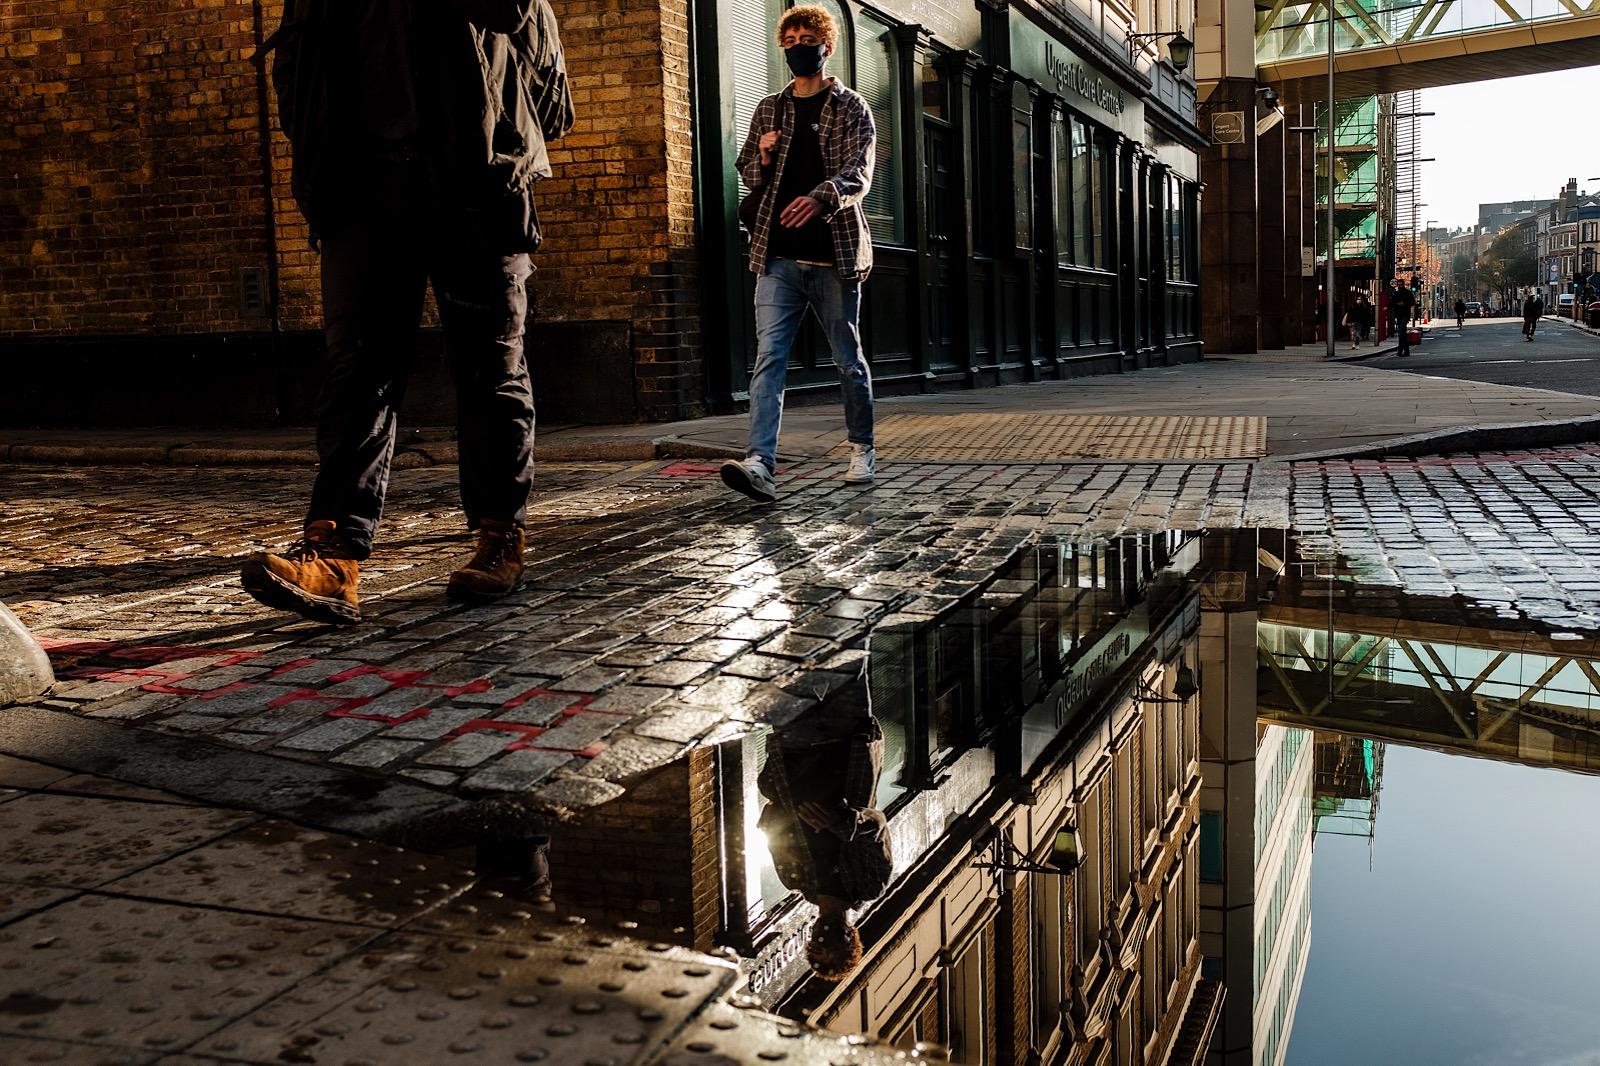 Man walking down London street wearing a mask reflected in the water